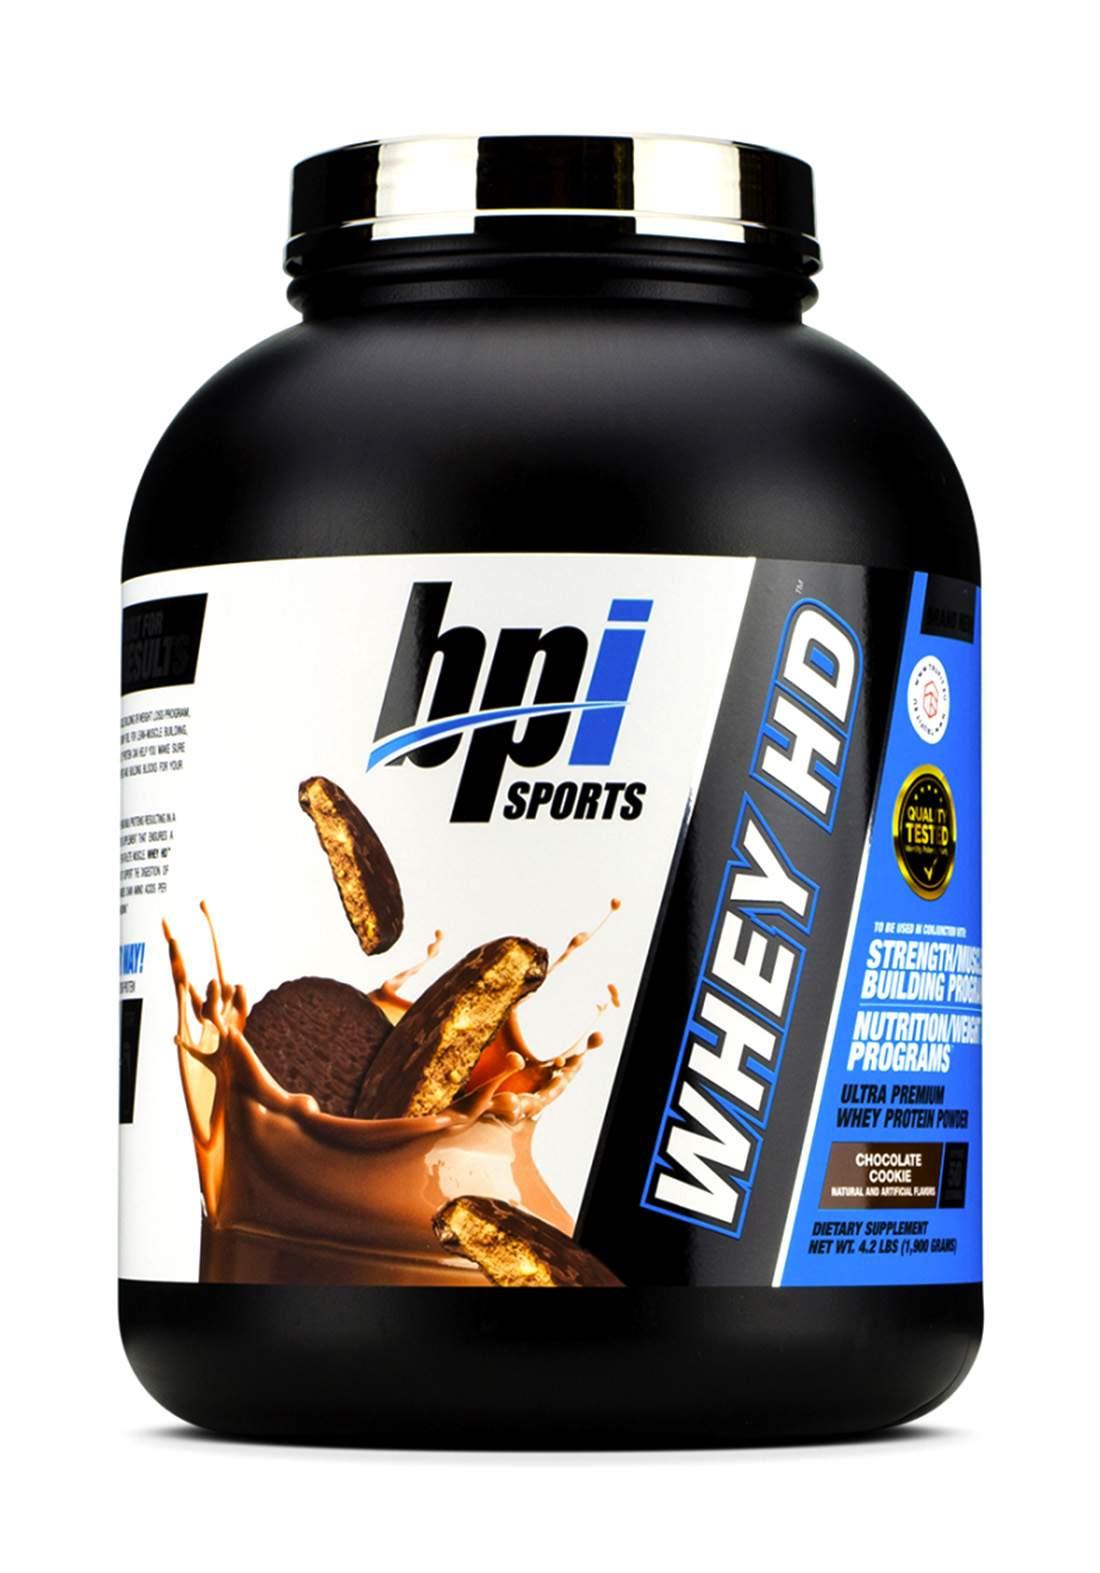 Bpi Sports Whey-Hd Ultra Premium Protein Chocolate1900gm بروتين بالشوكولاتة